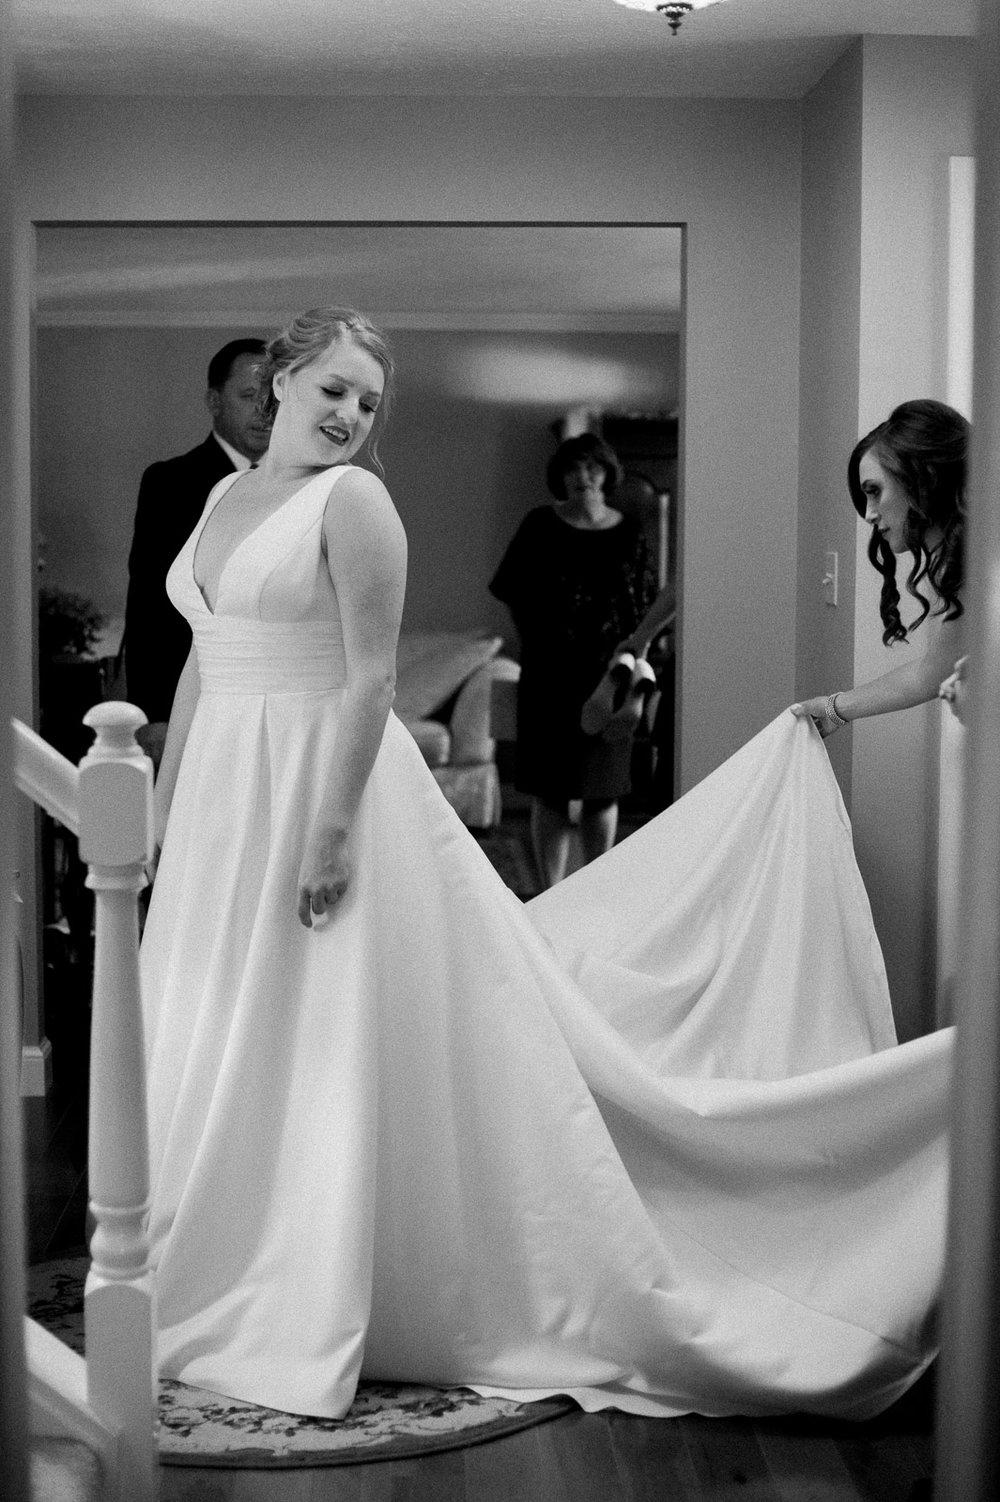 cleveland-yacht-club-wedding-photos-by-matt-erickson-photography-3.jpg